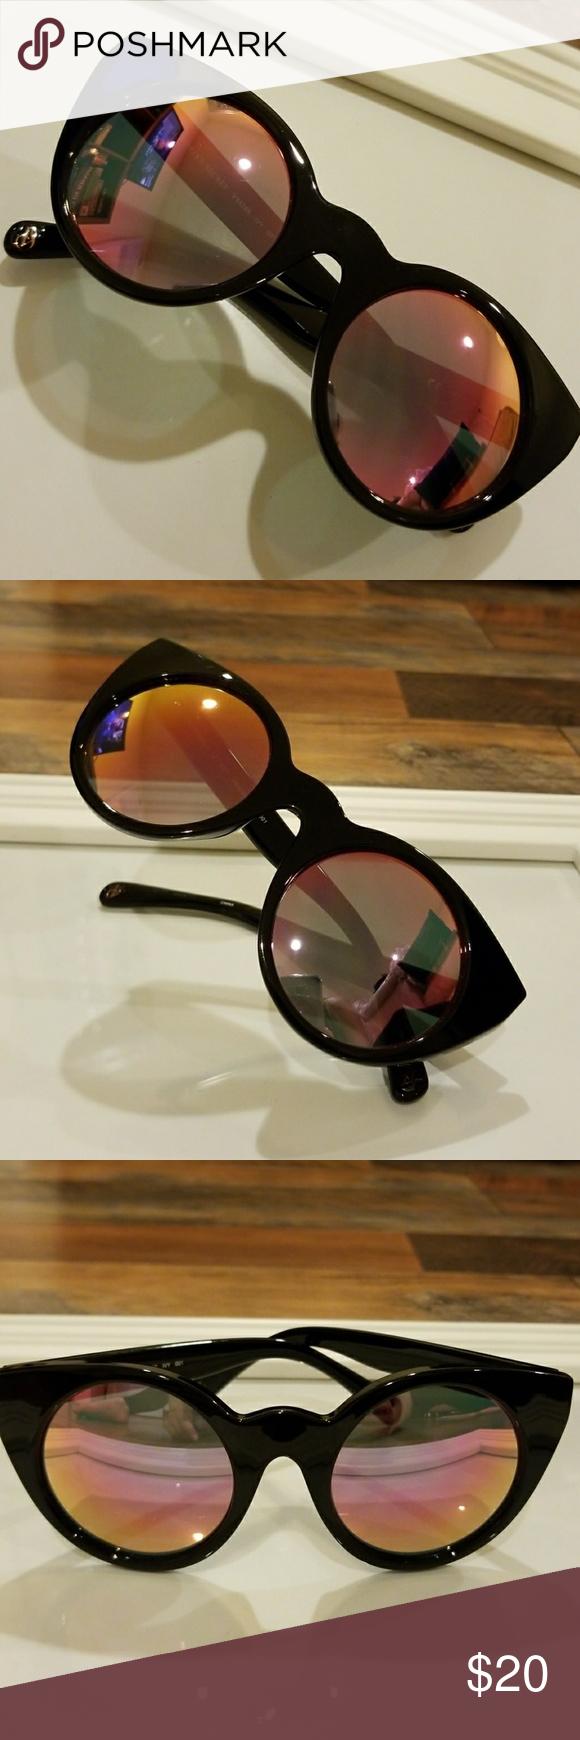 58bac7e2febd3 Victoria's secret cat eye sunglasses NWOT Make your friends jealous ...